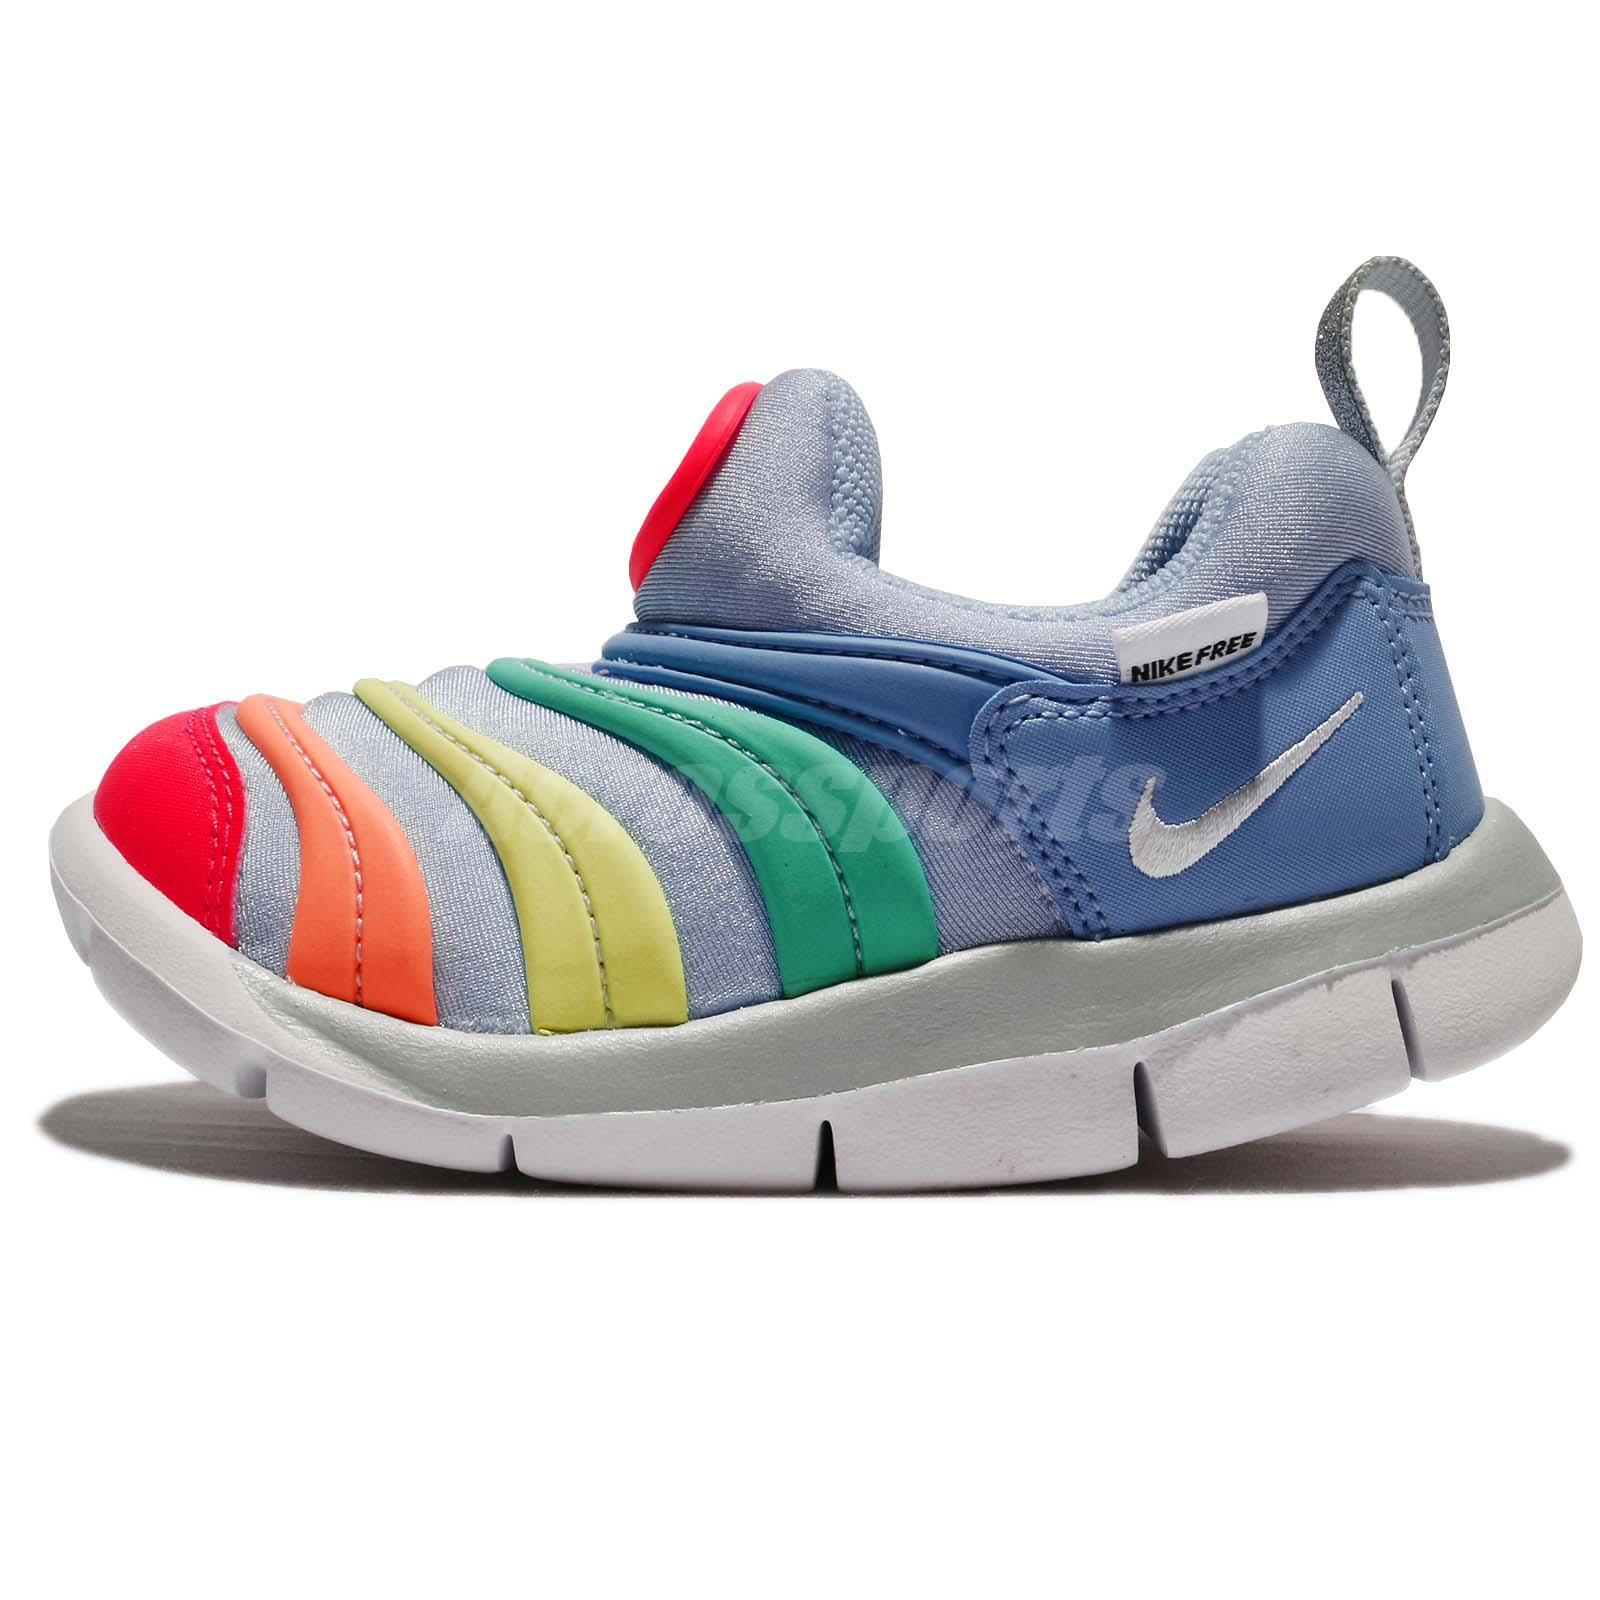 Nike Dynamo Free TD Royal Tint Rainbow Toddler Infant Baby Shoes